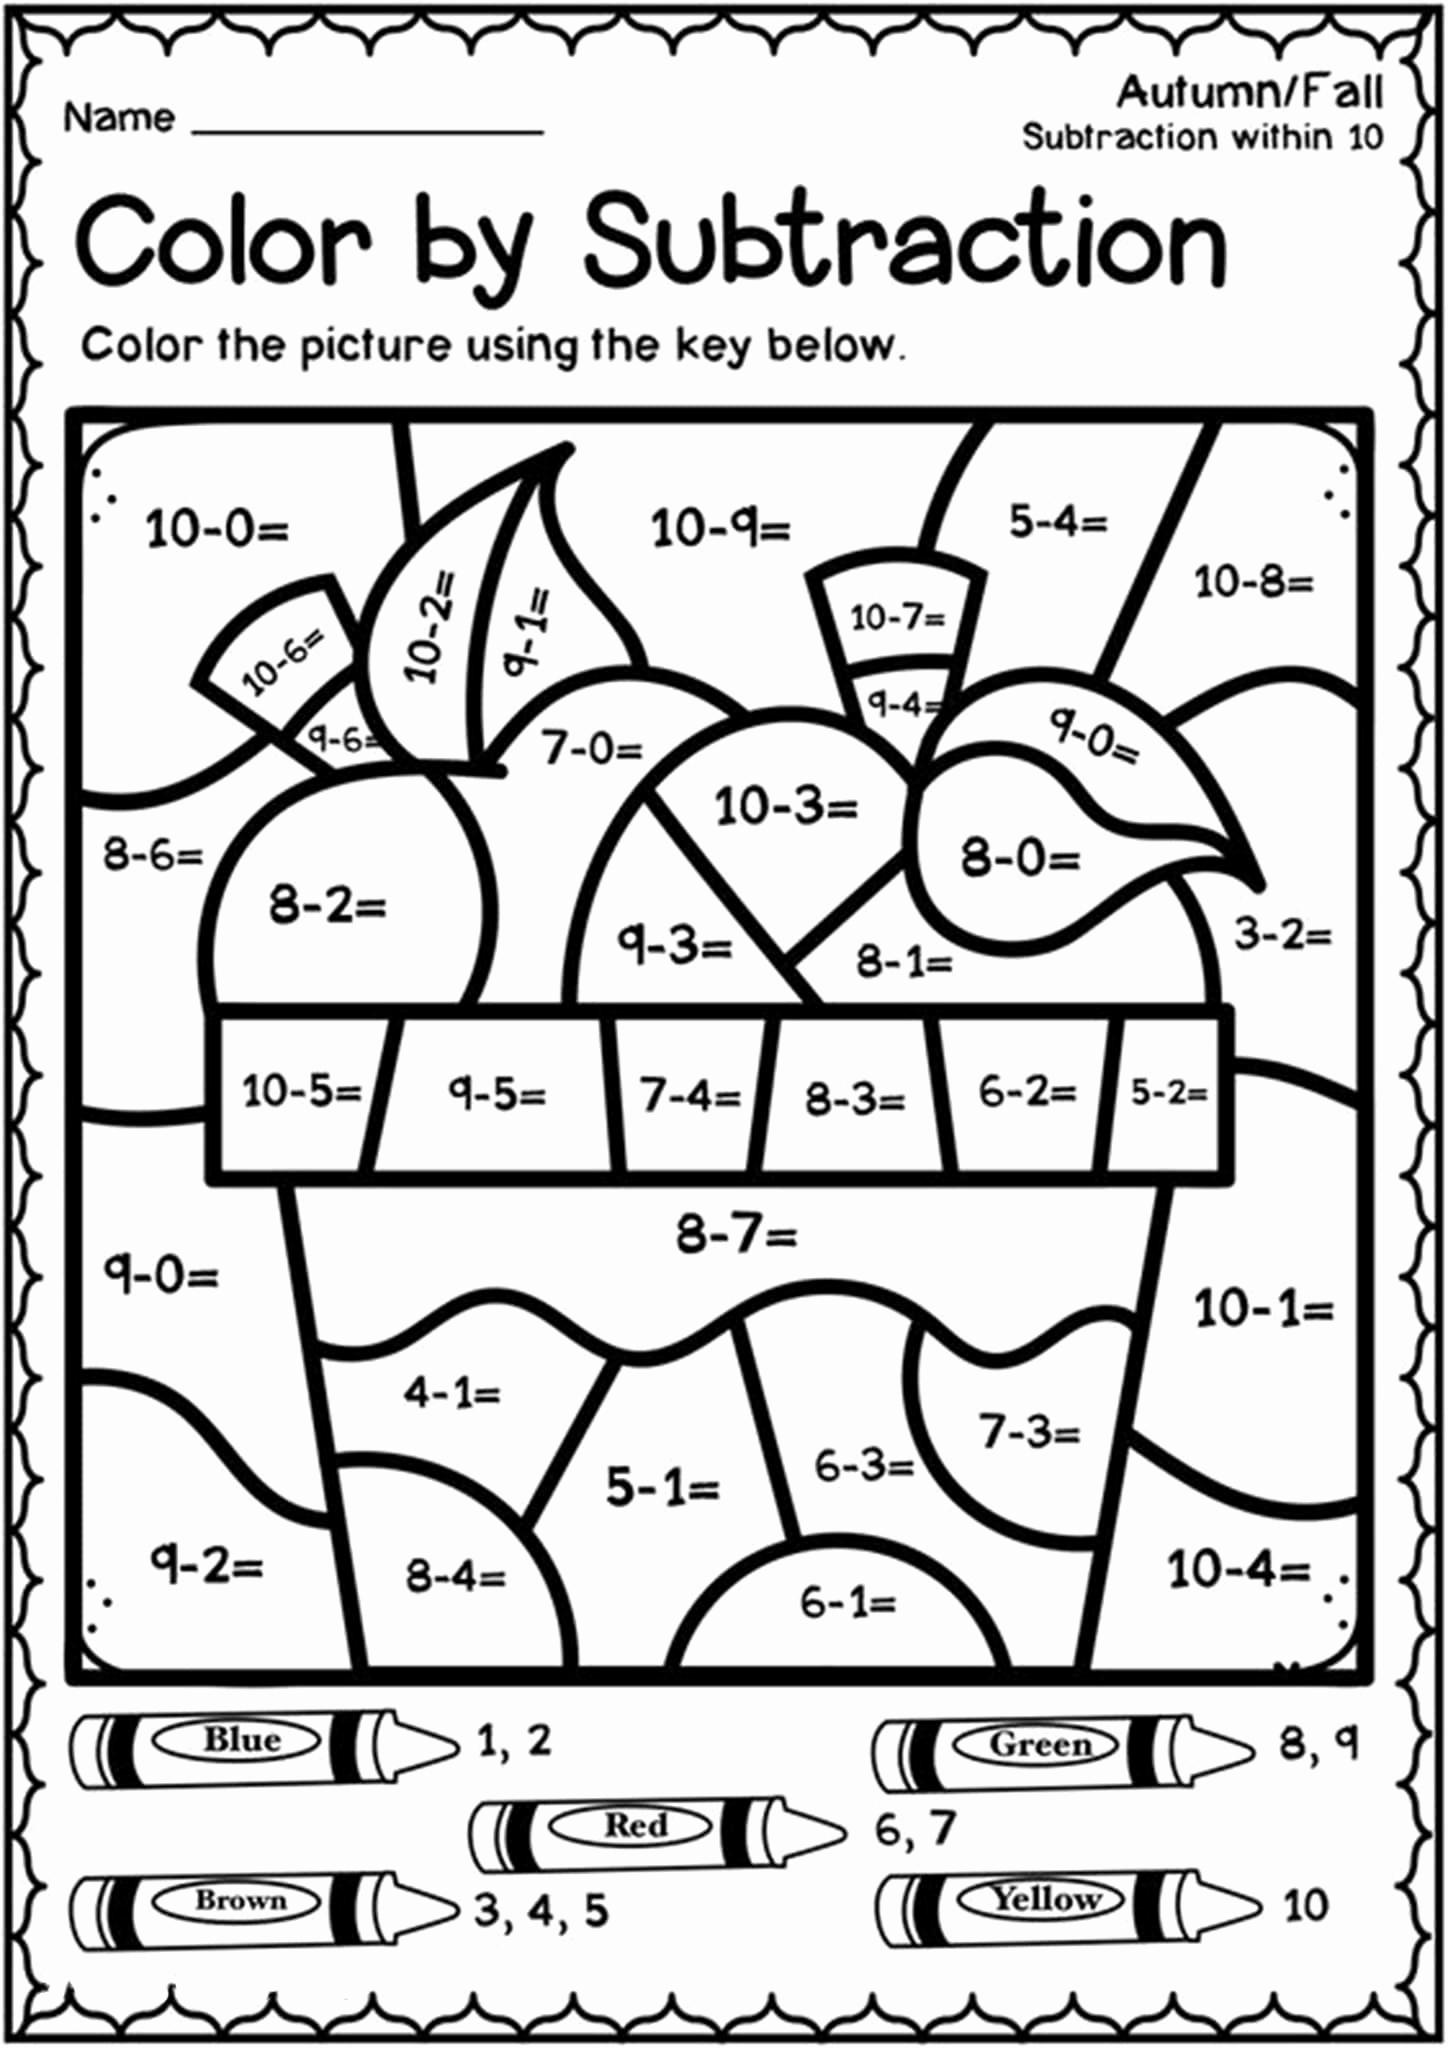 Color by Number Worksheets Kindergarten Luxury Free Printable Color by Number Worksheets for Kindergarten